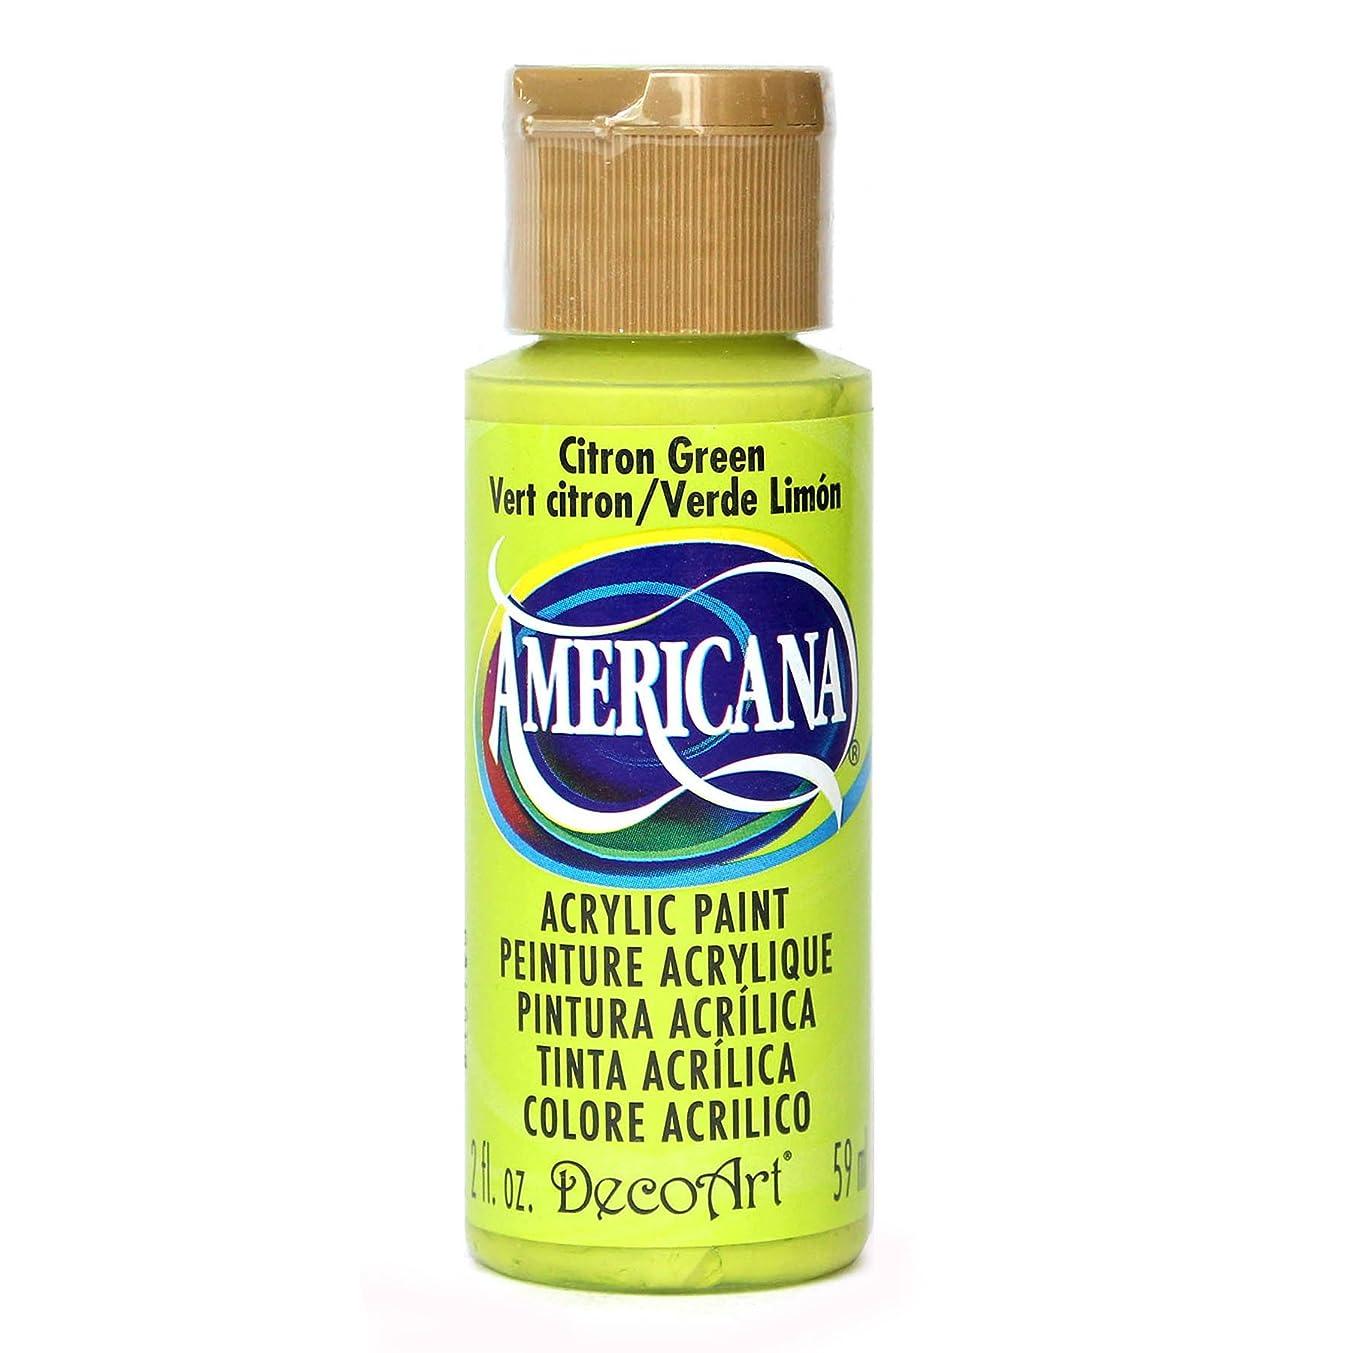 DecoArt Americana Acrylic Paint, 2-Ounce, Citron Green